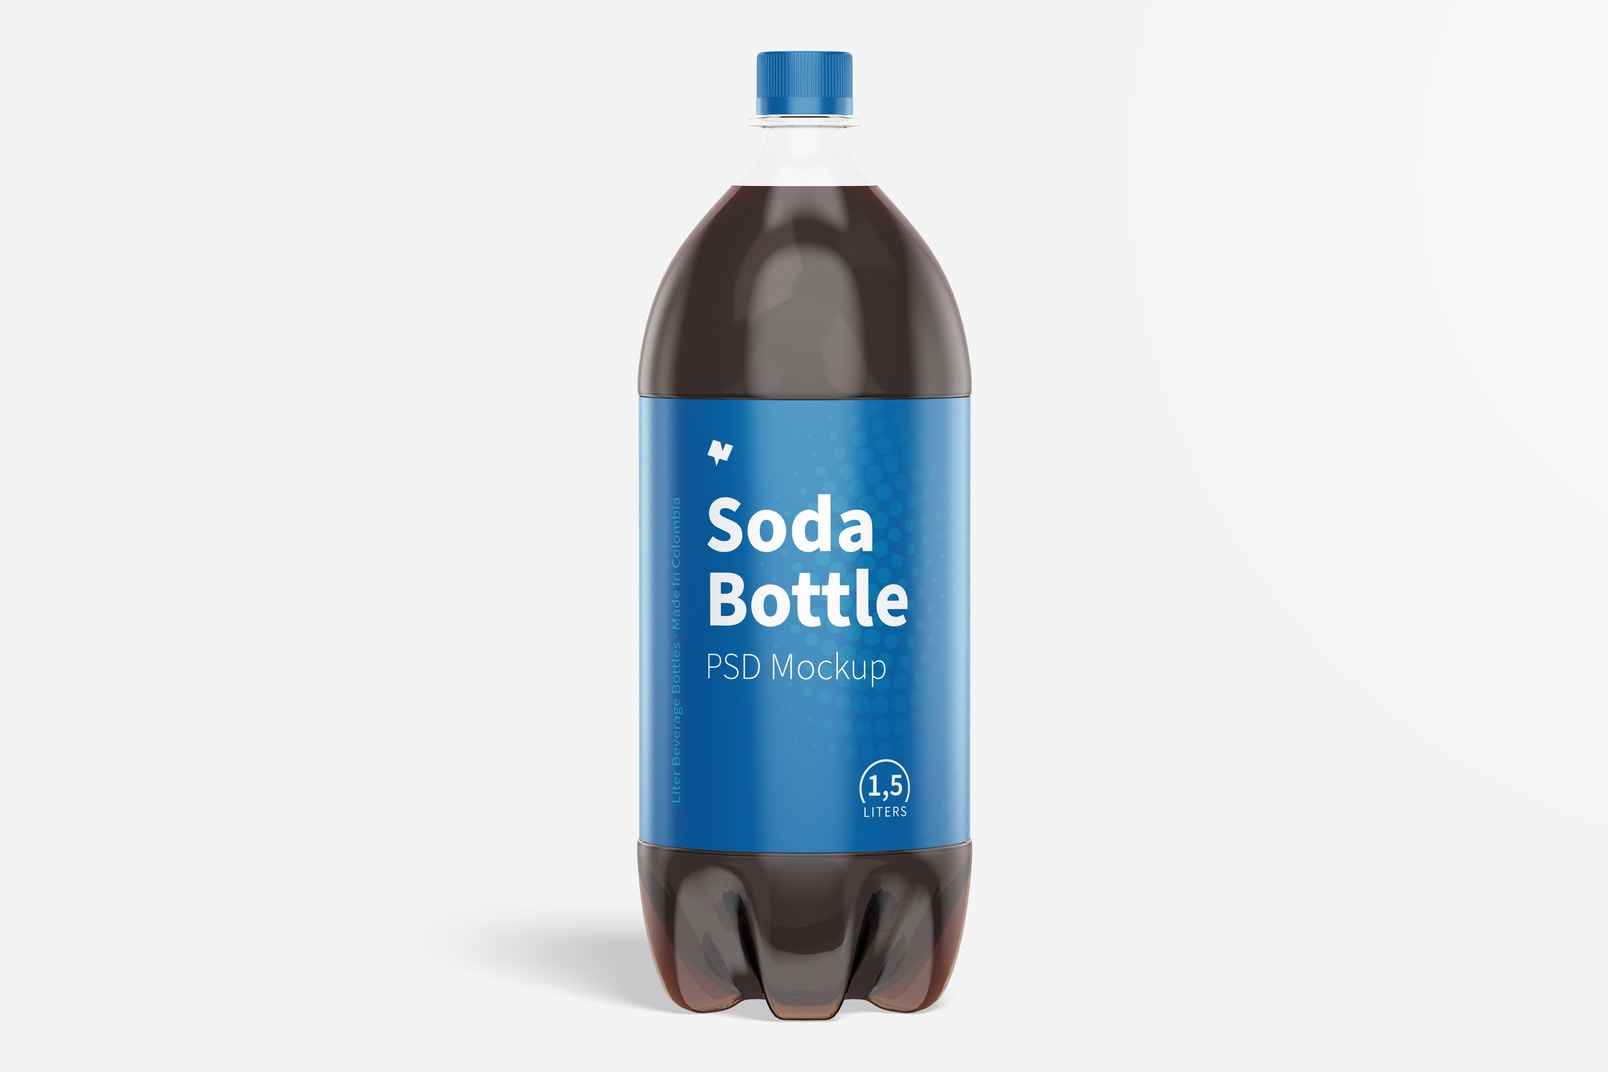 1.5L Pepsi Bottle Mockup, Front View